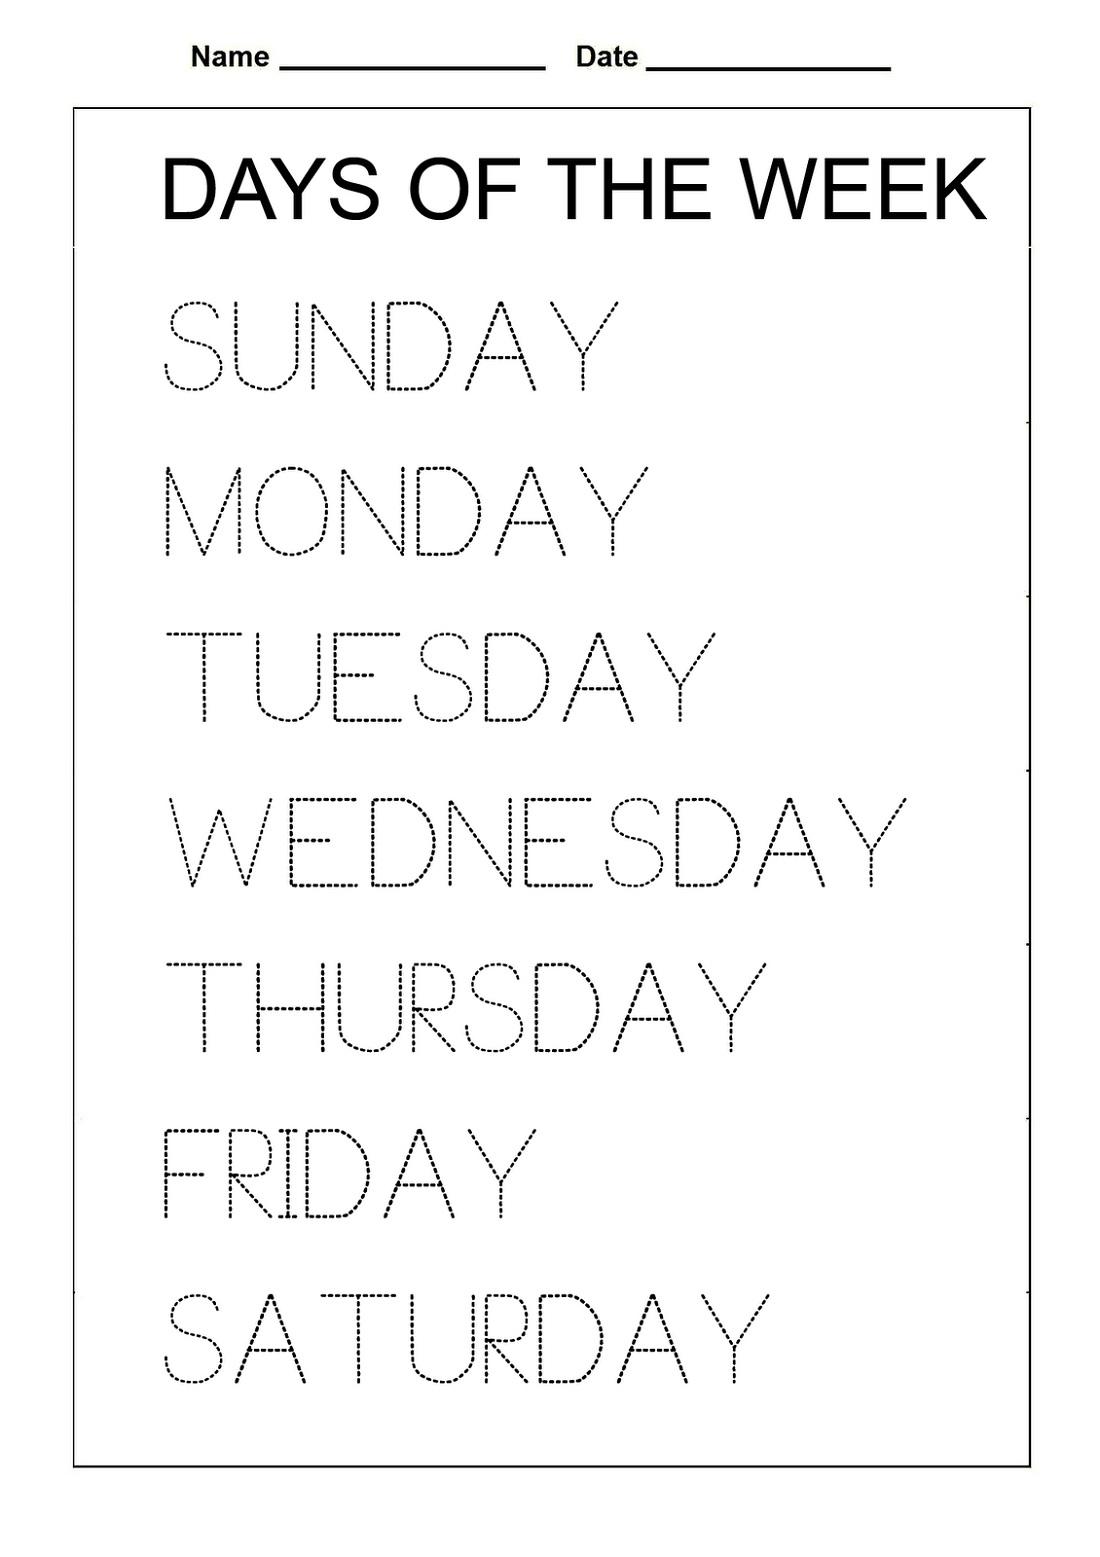 Days Of The Week Worksheet Activities